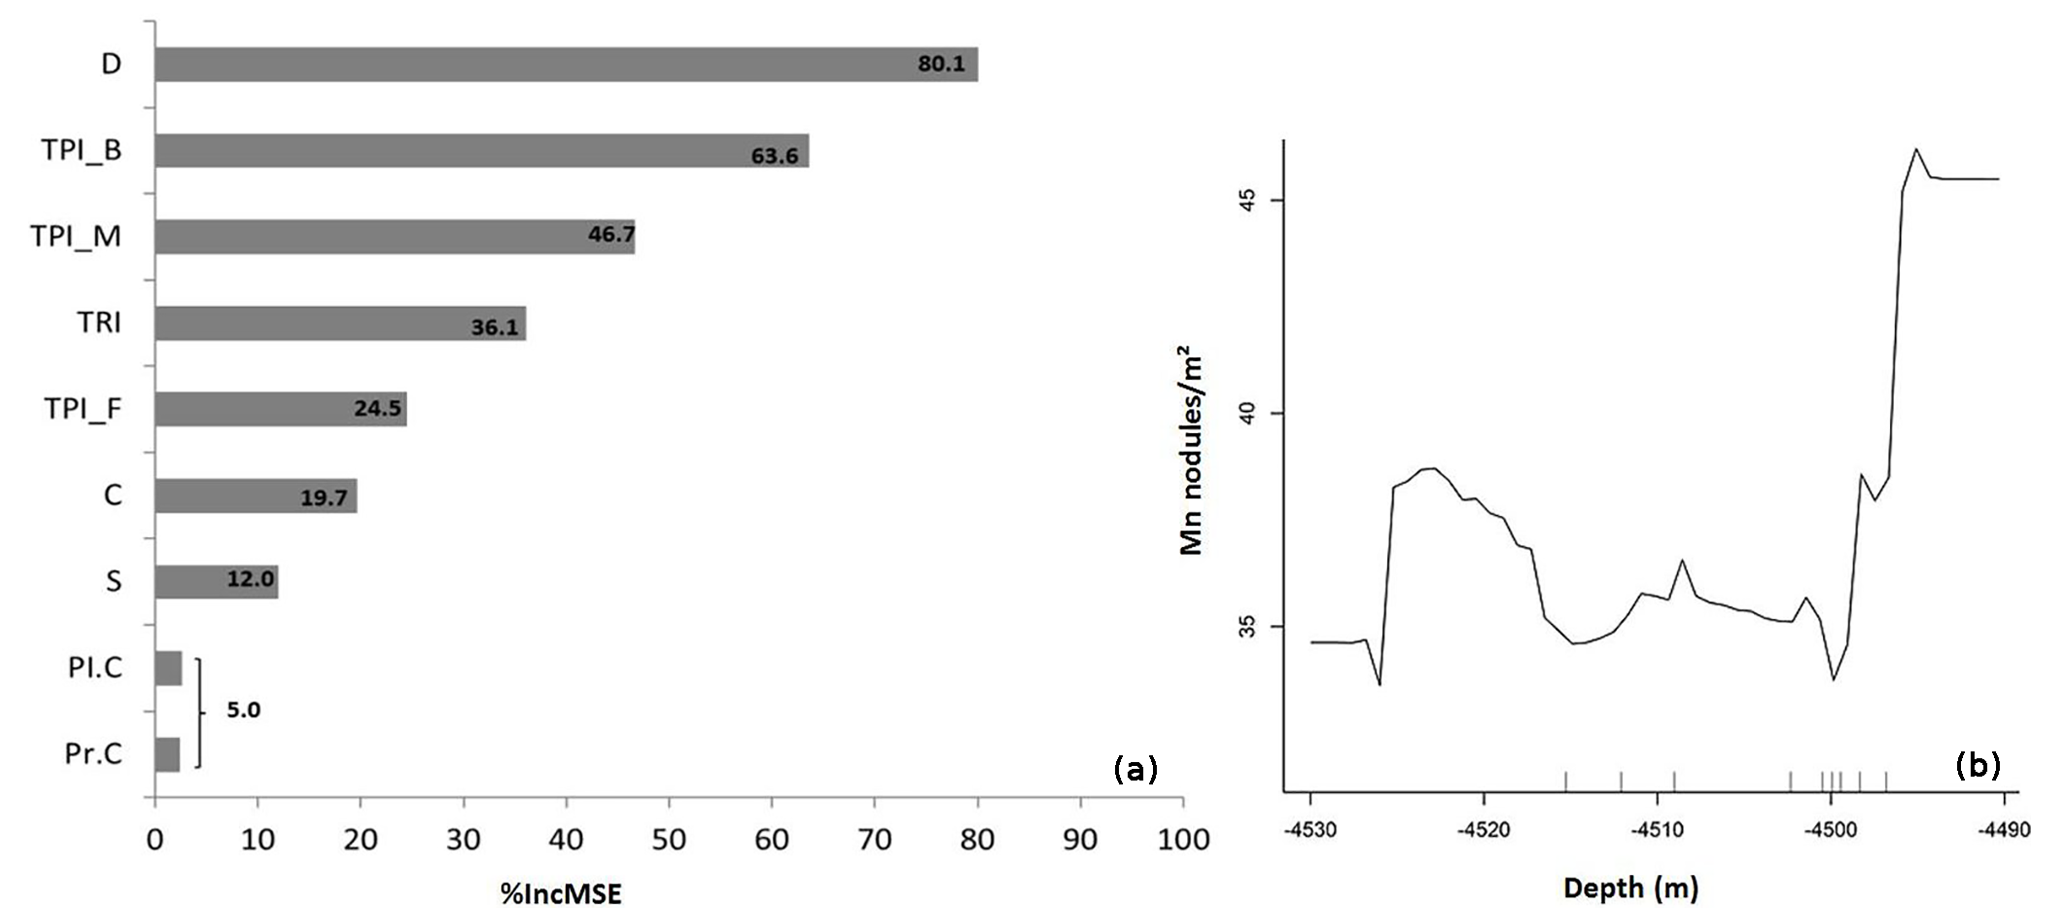 BG - Quantitative mapping and predictive modeling of Mn nodules